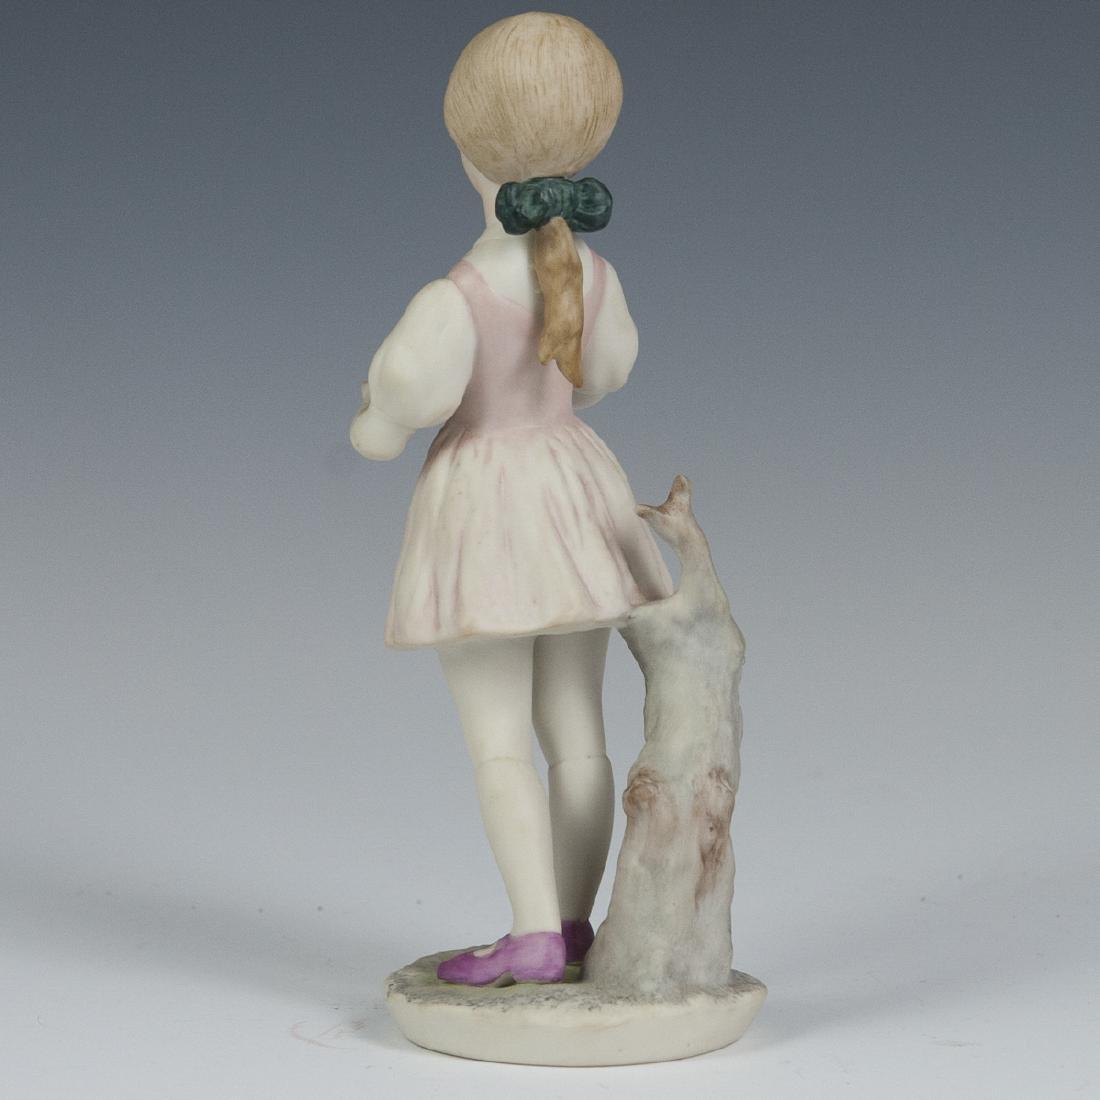 Sybis Bisque Porcelain Figurine - 5